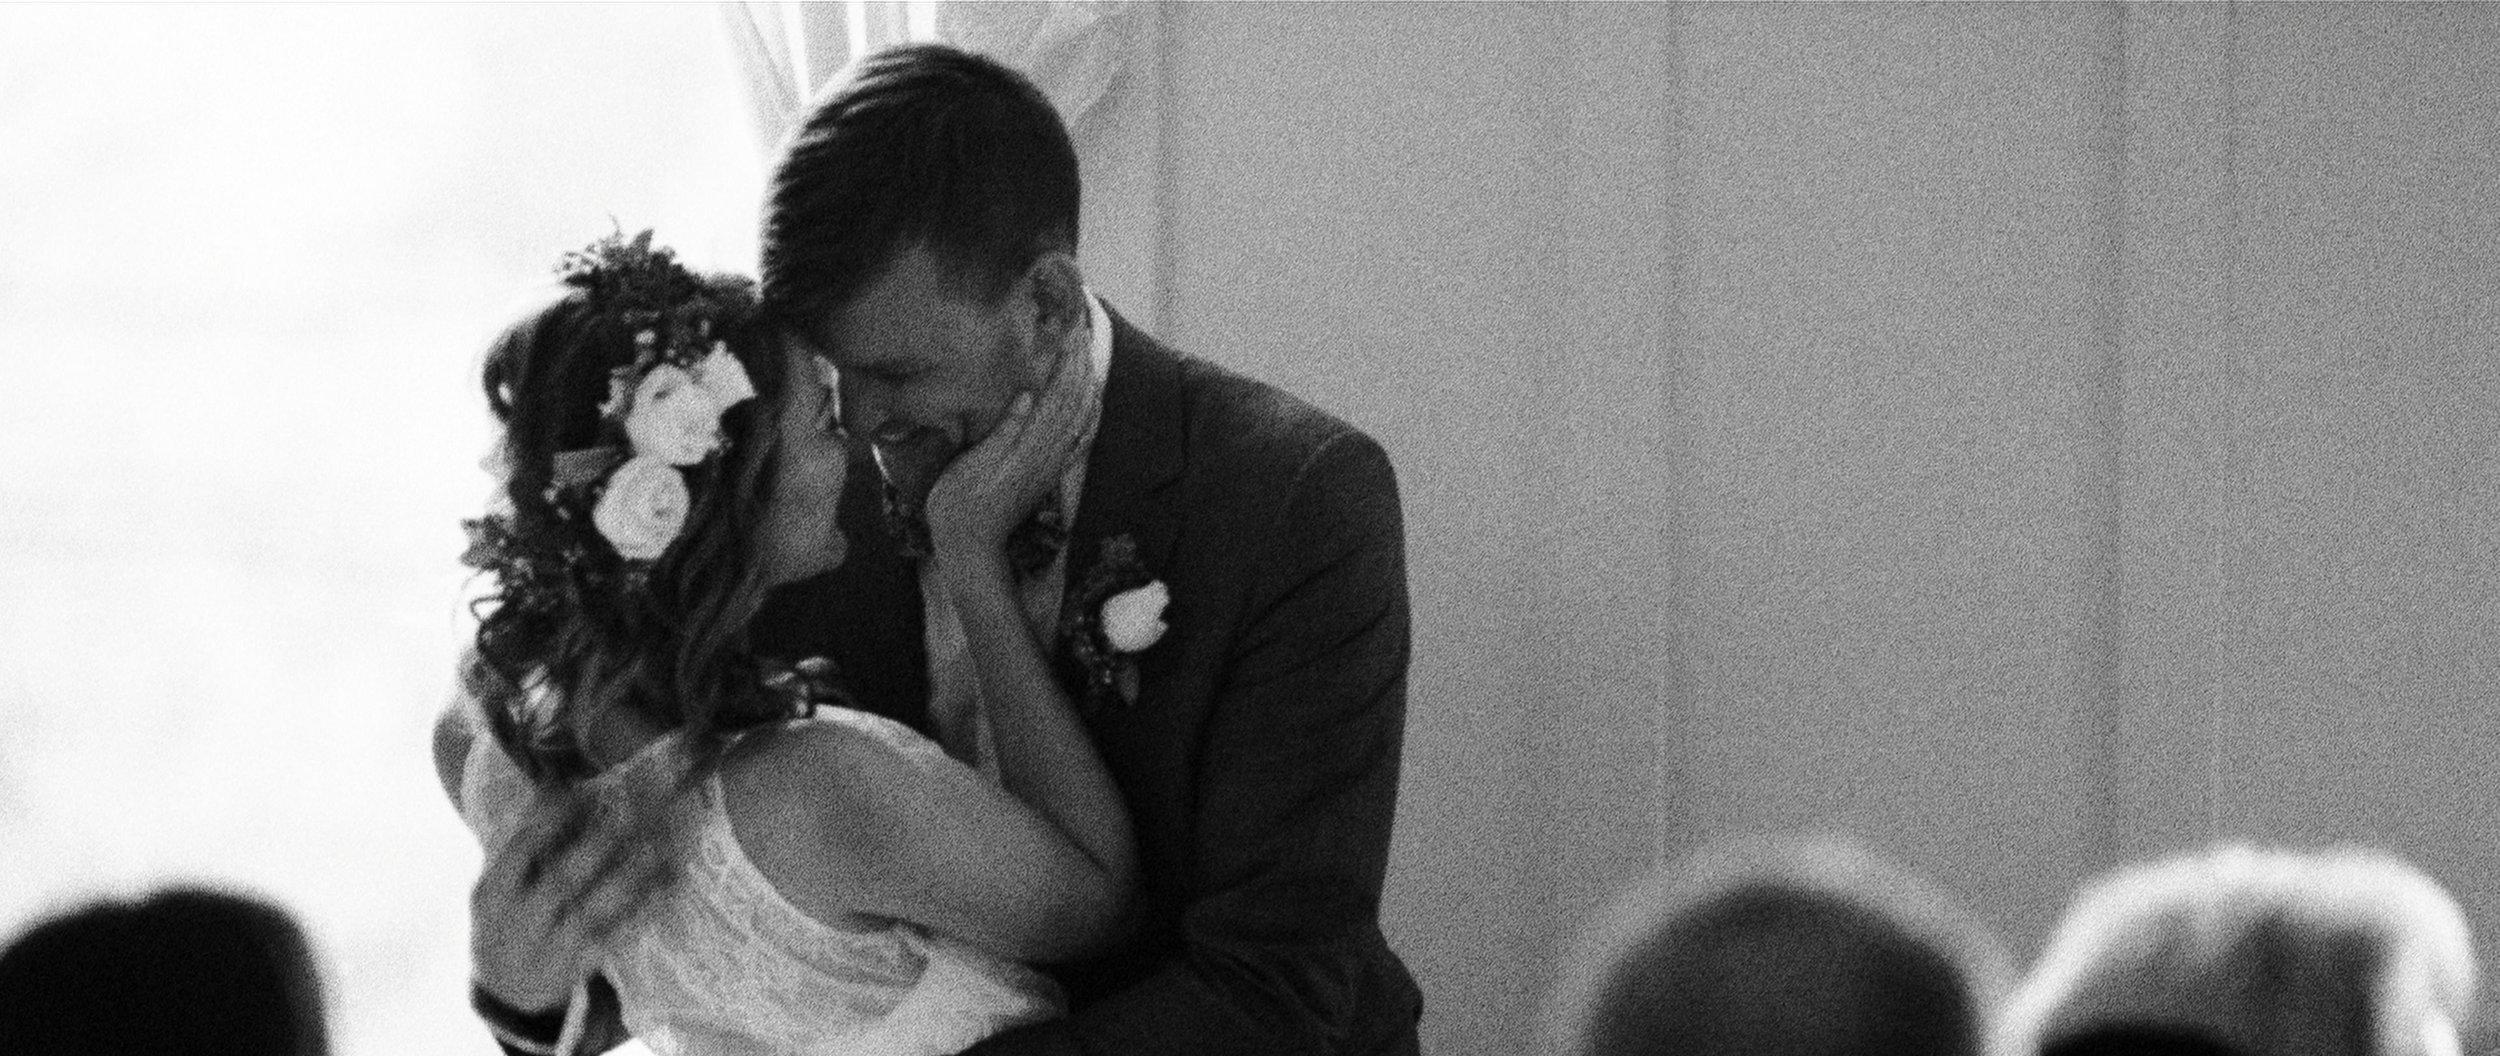 vancouver-wedding-videography187.jpg